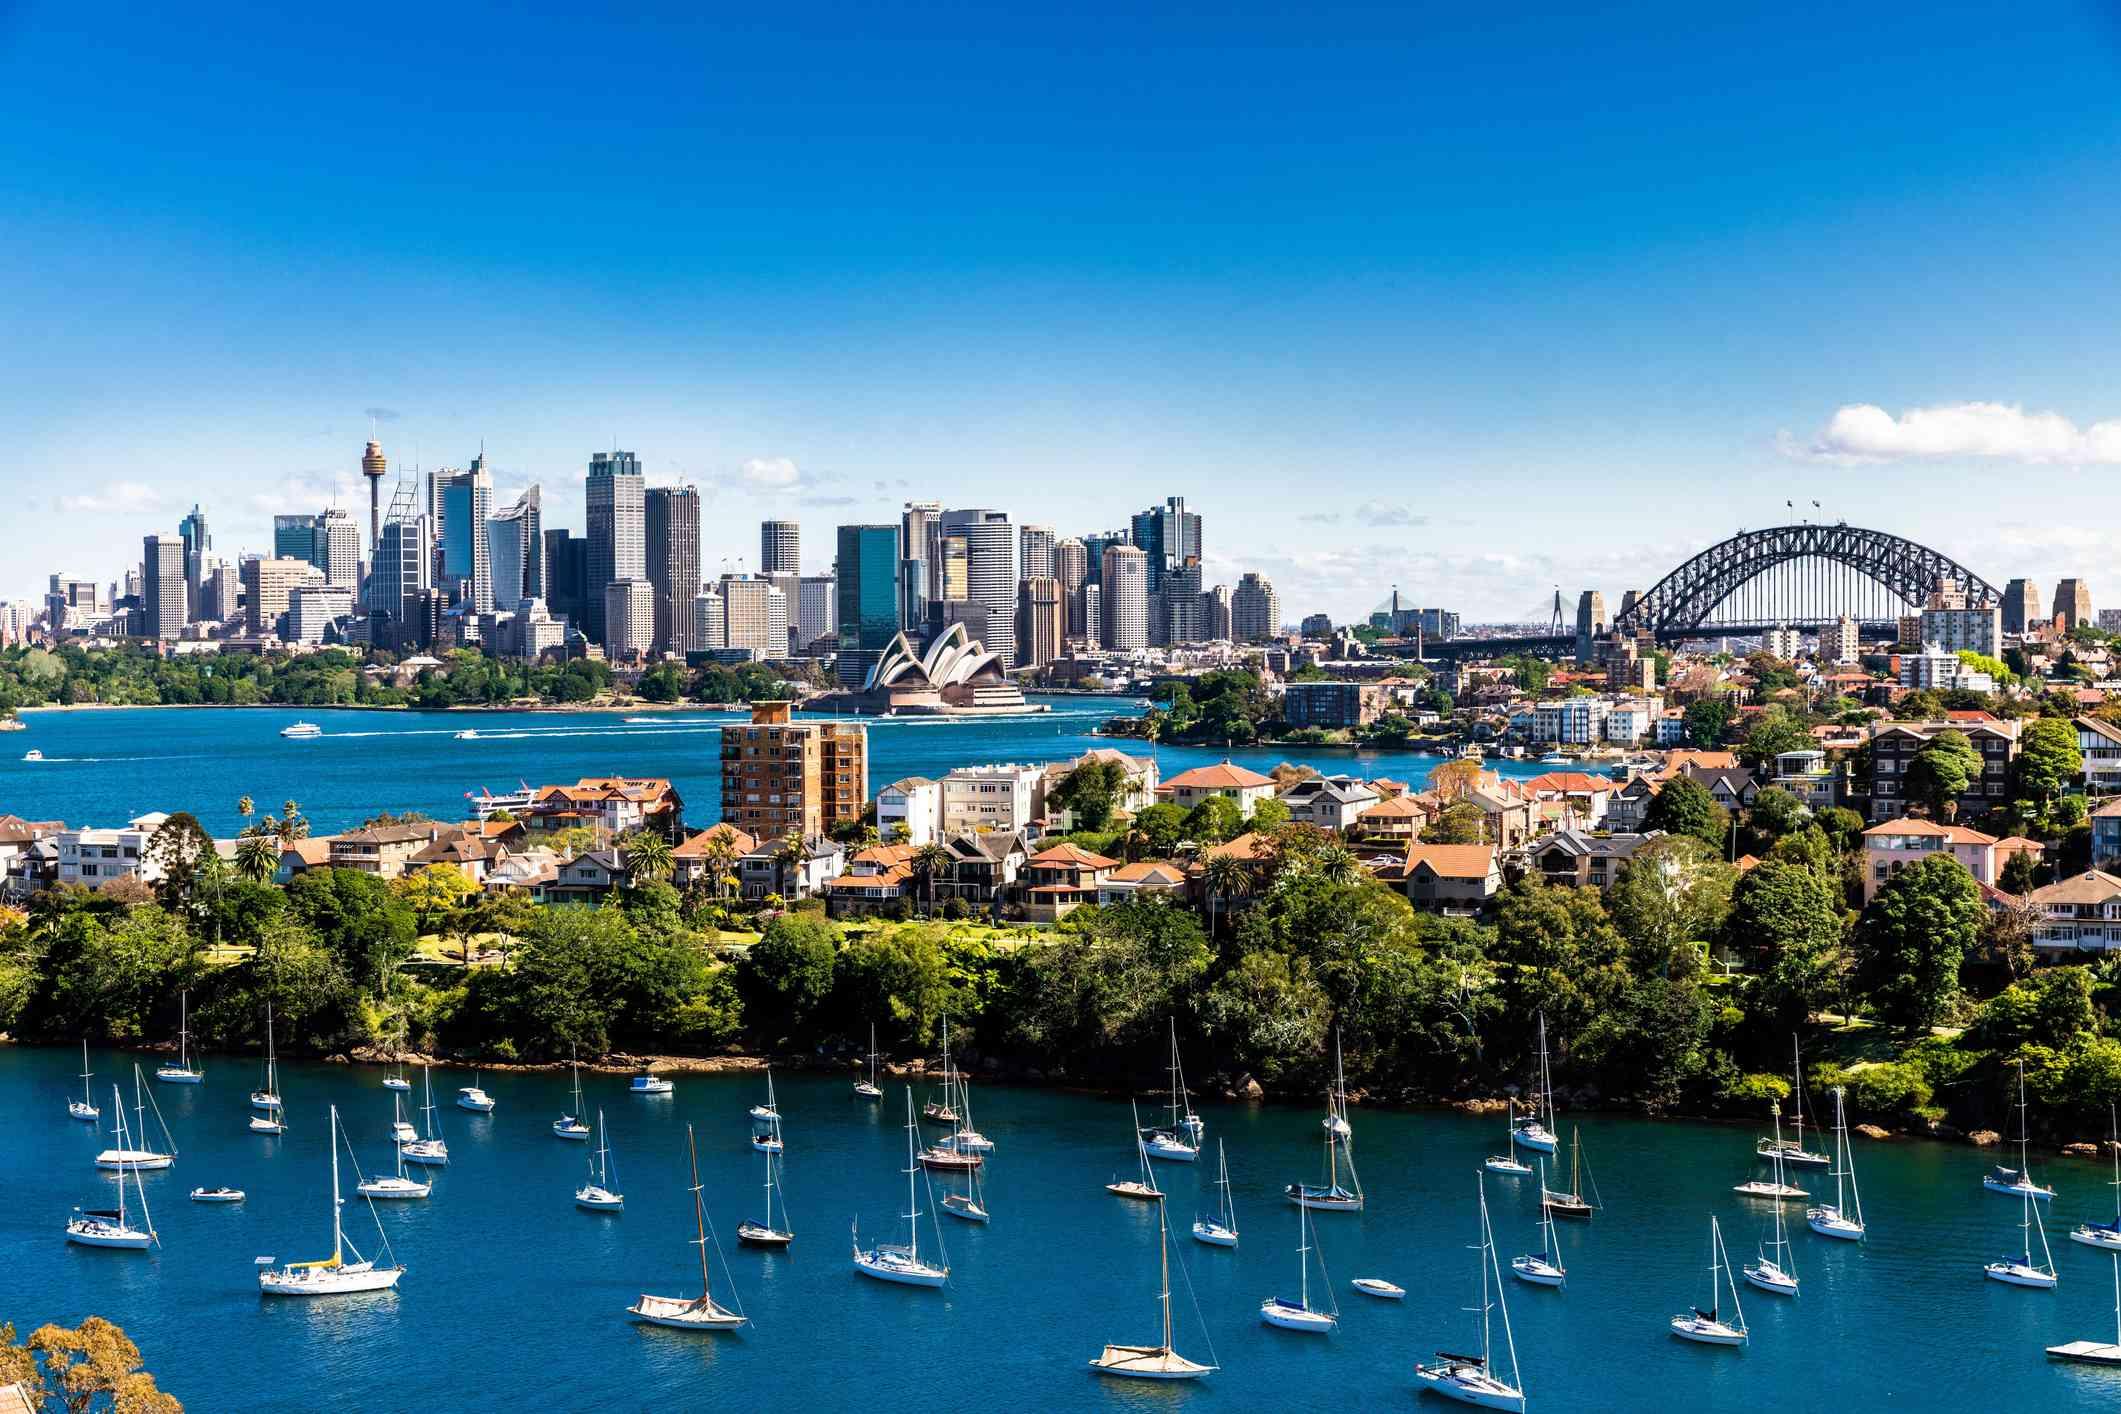 Sydney Harbour with views of the Harbour Bridge